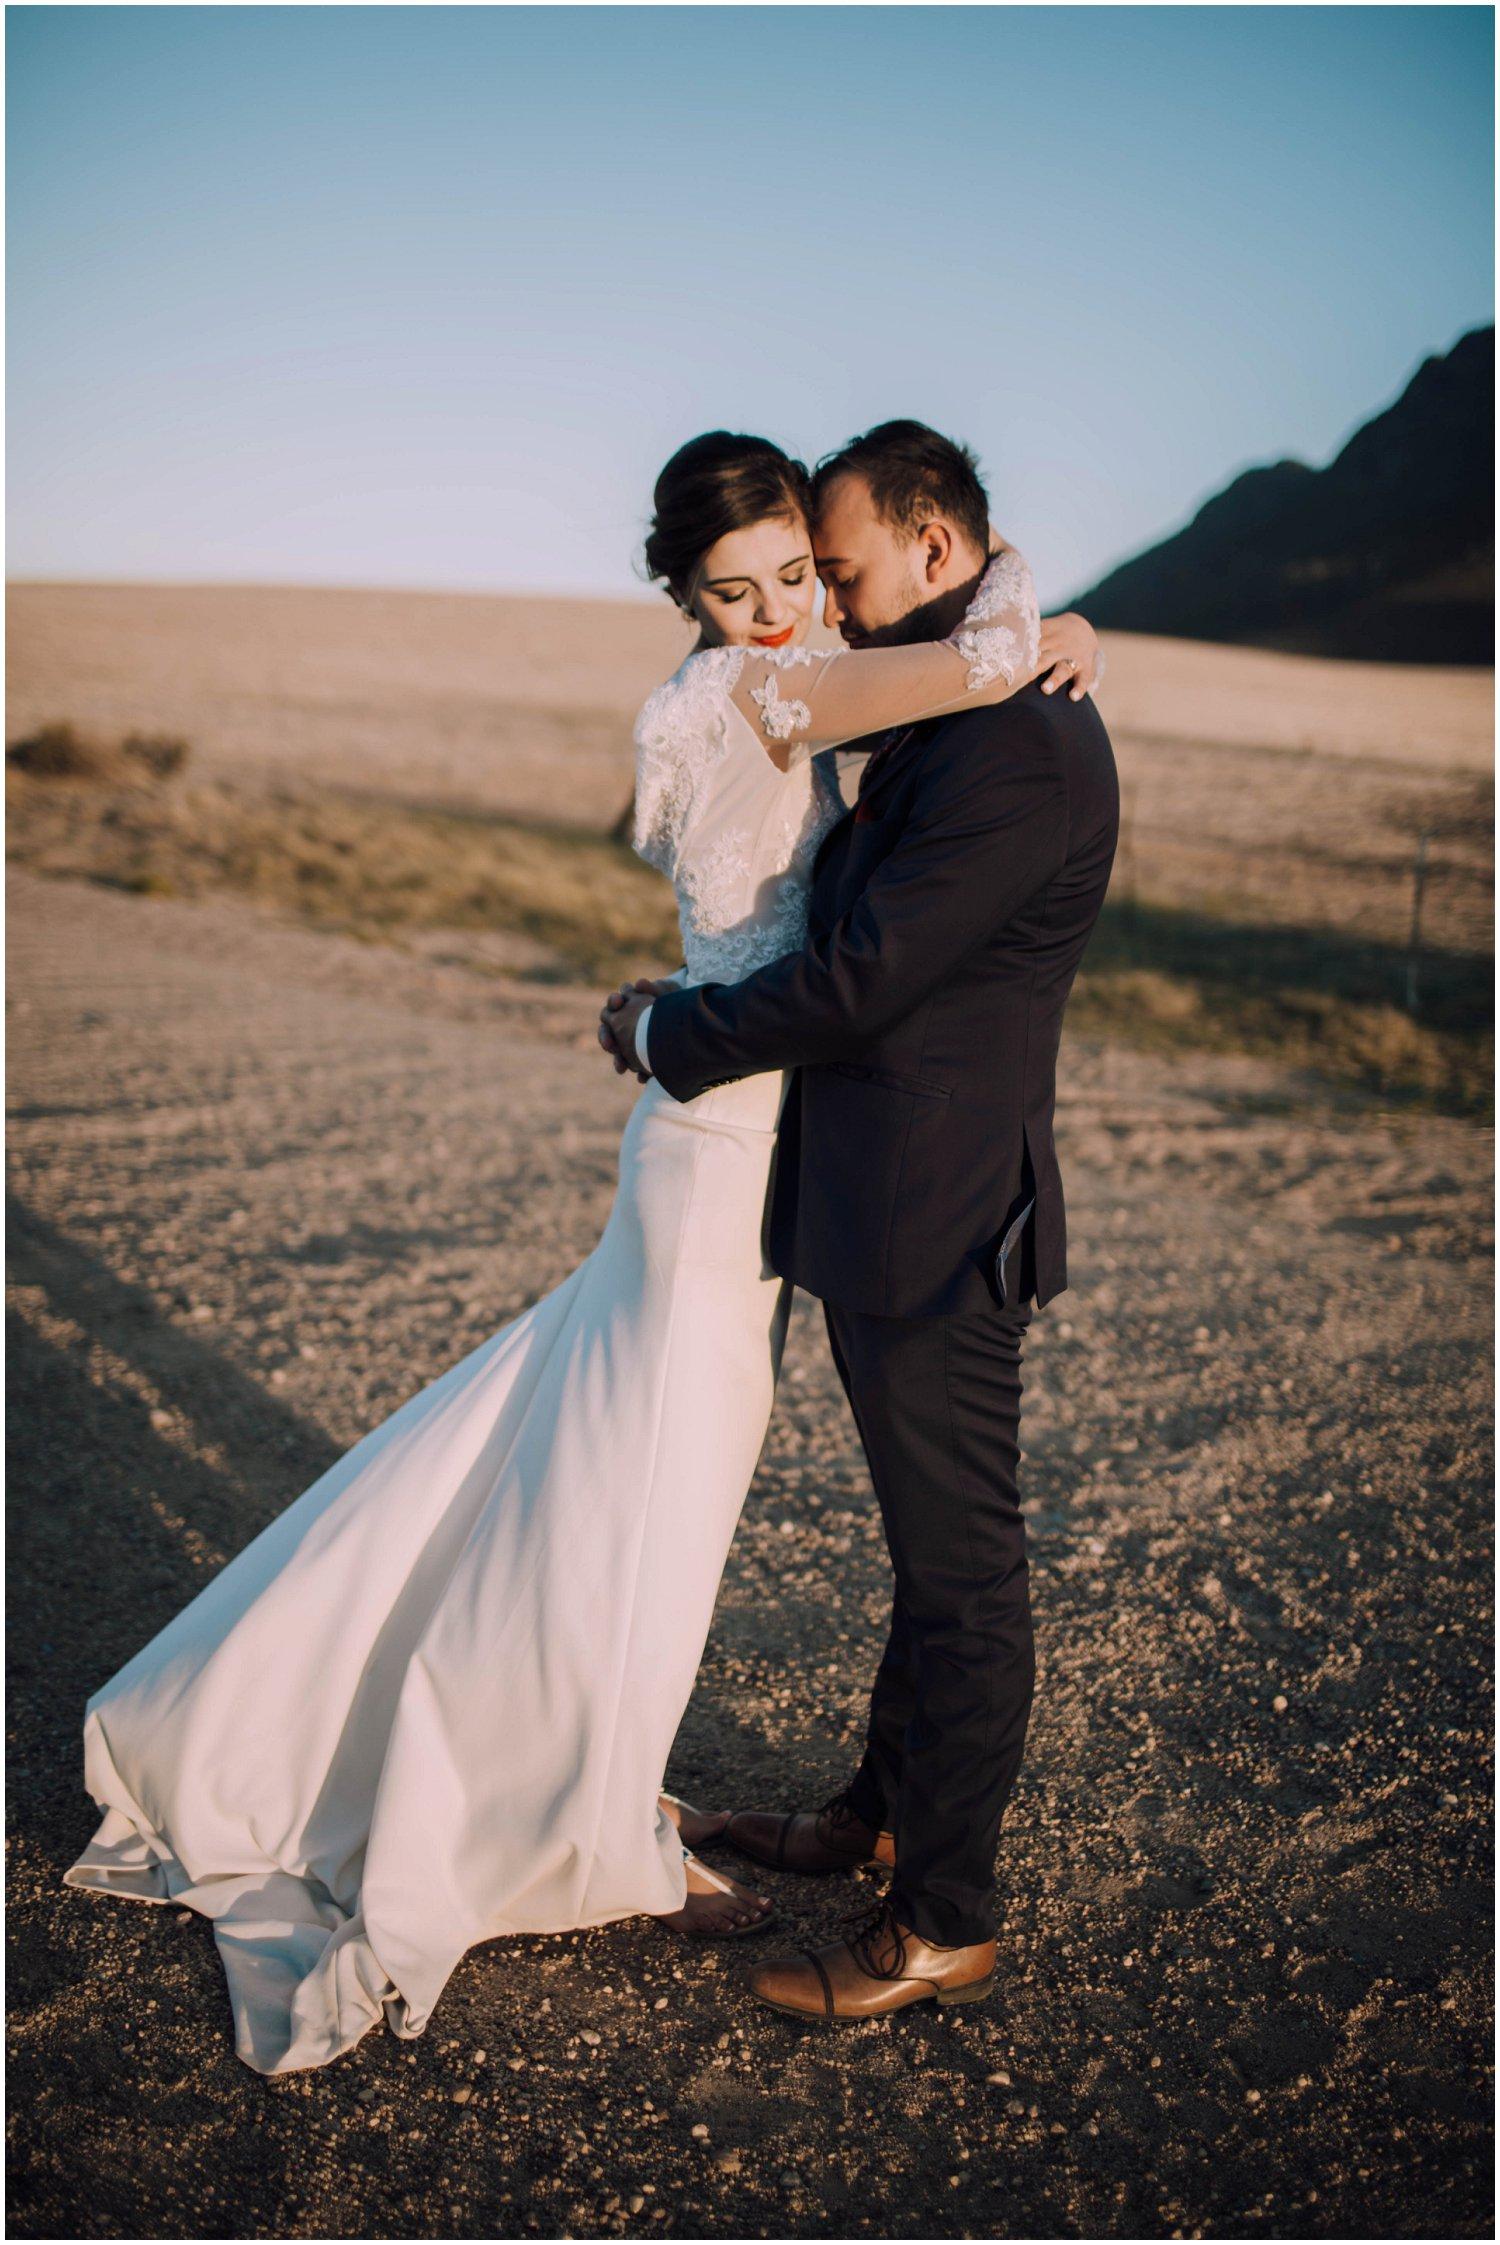 cape town wedding photographer rue kruger roneal stephan groenrivier (51).jpg